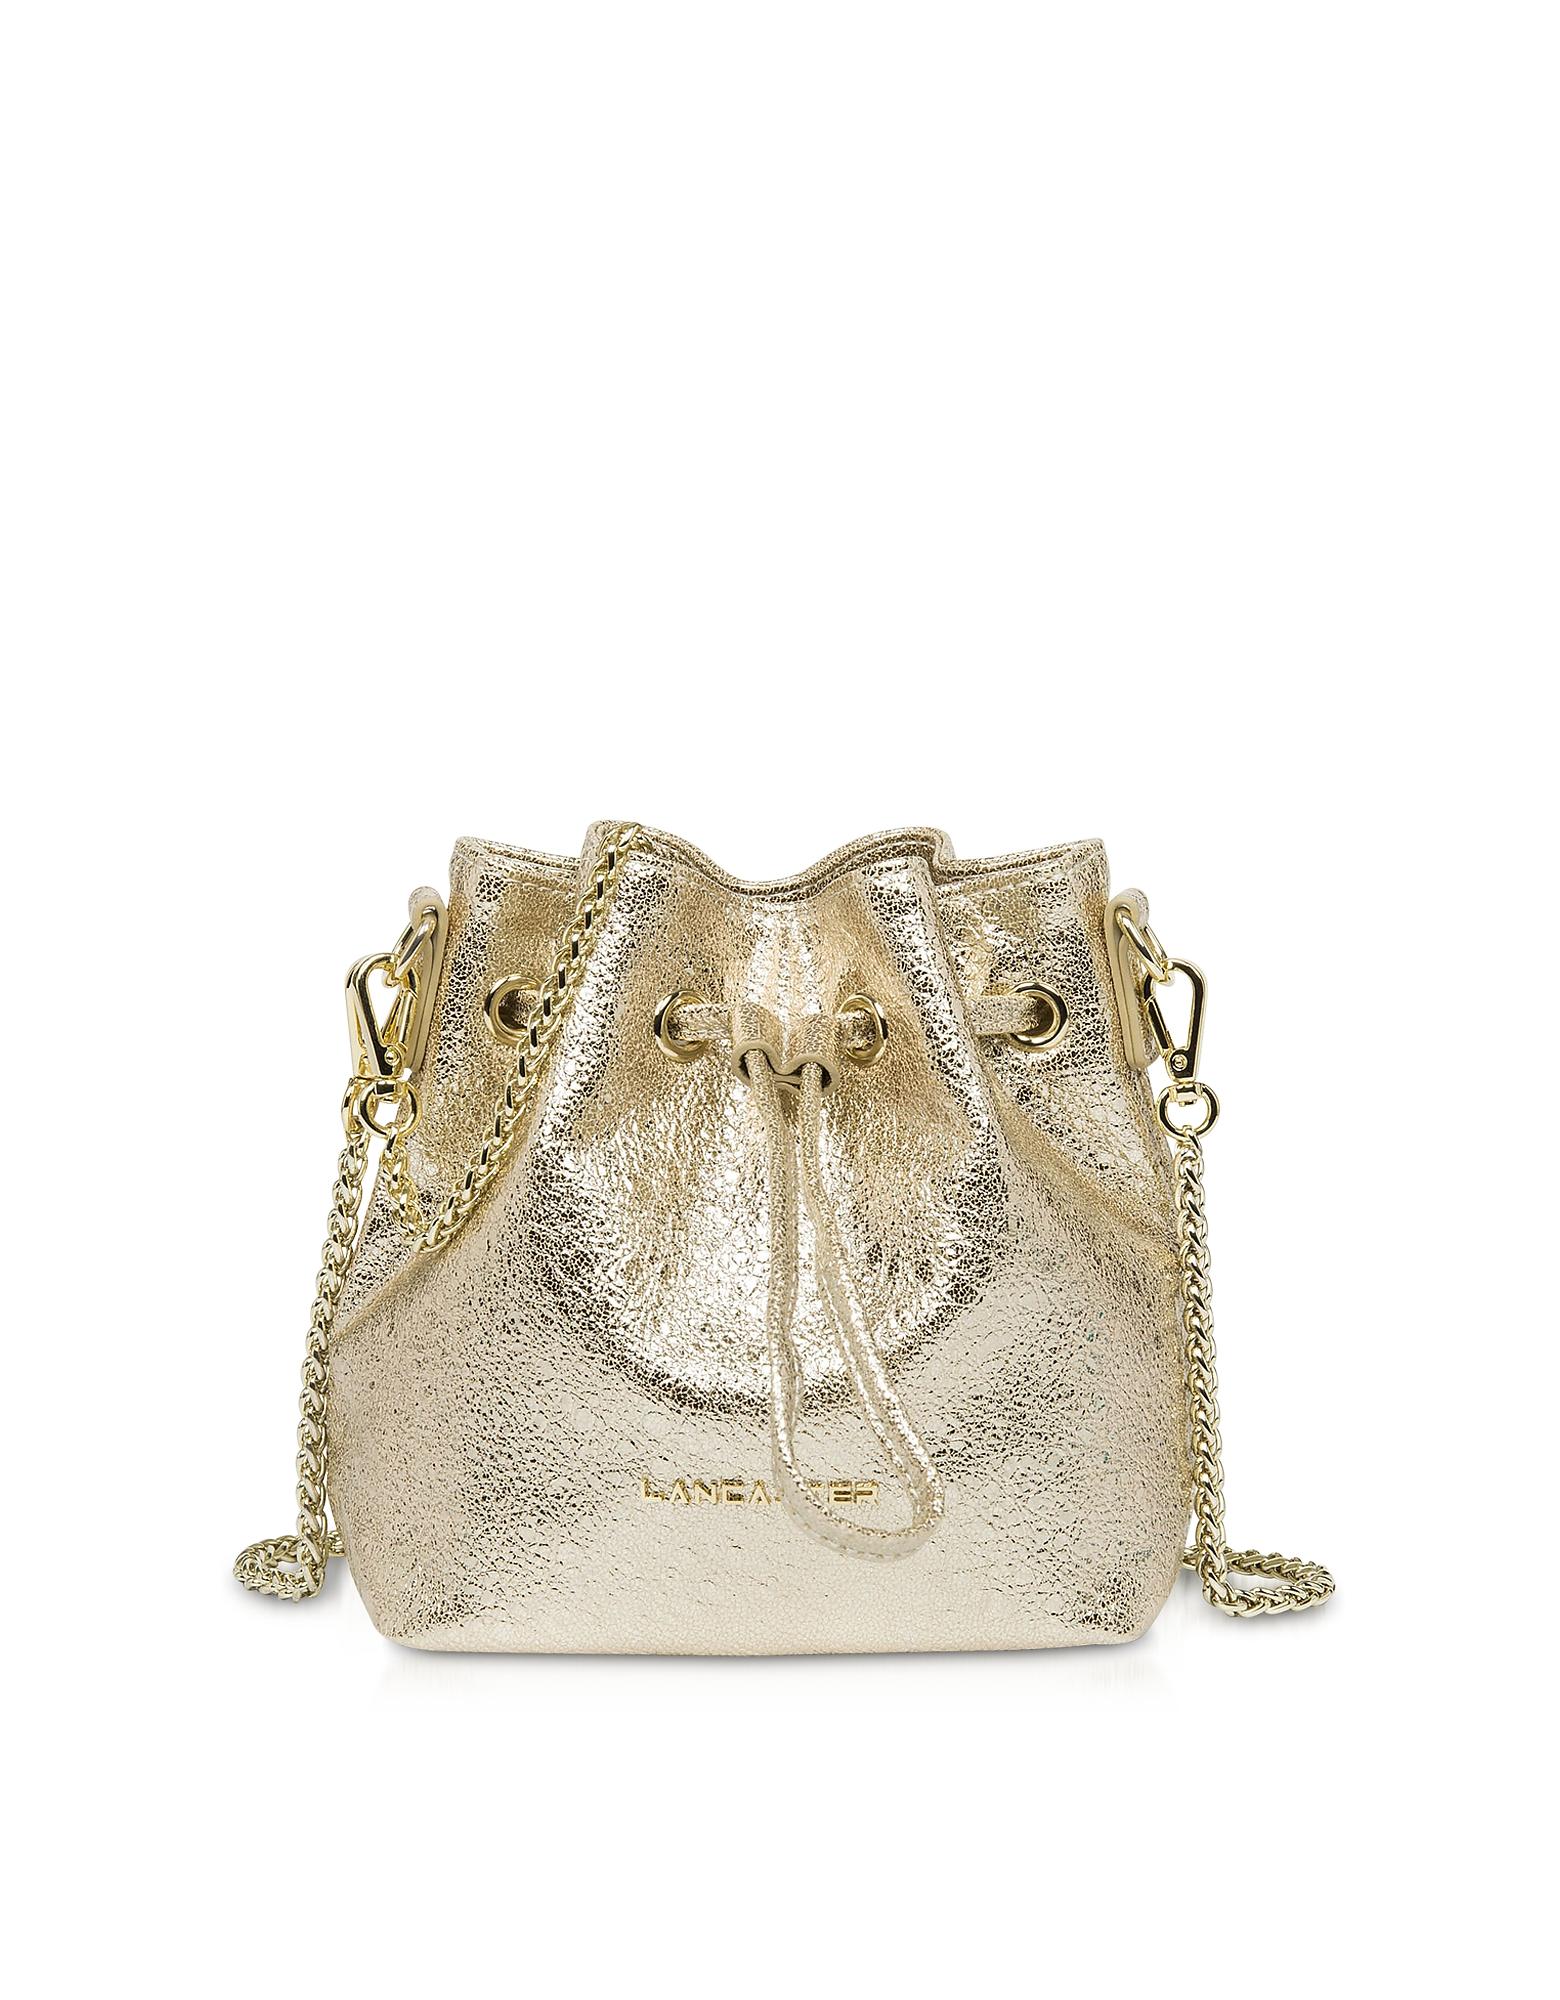 Lancaster Paris Handbags, Actual Shiny Mini Bucket Bag